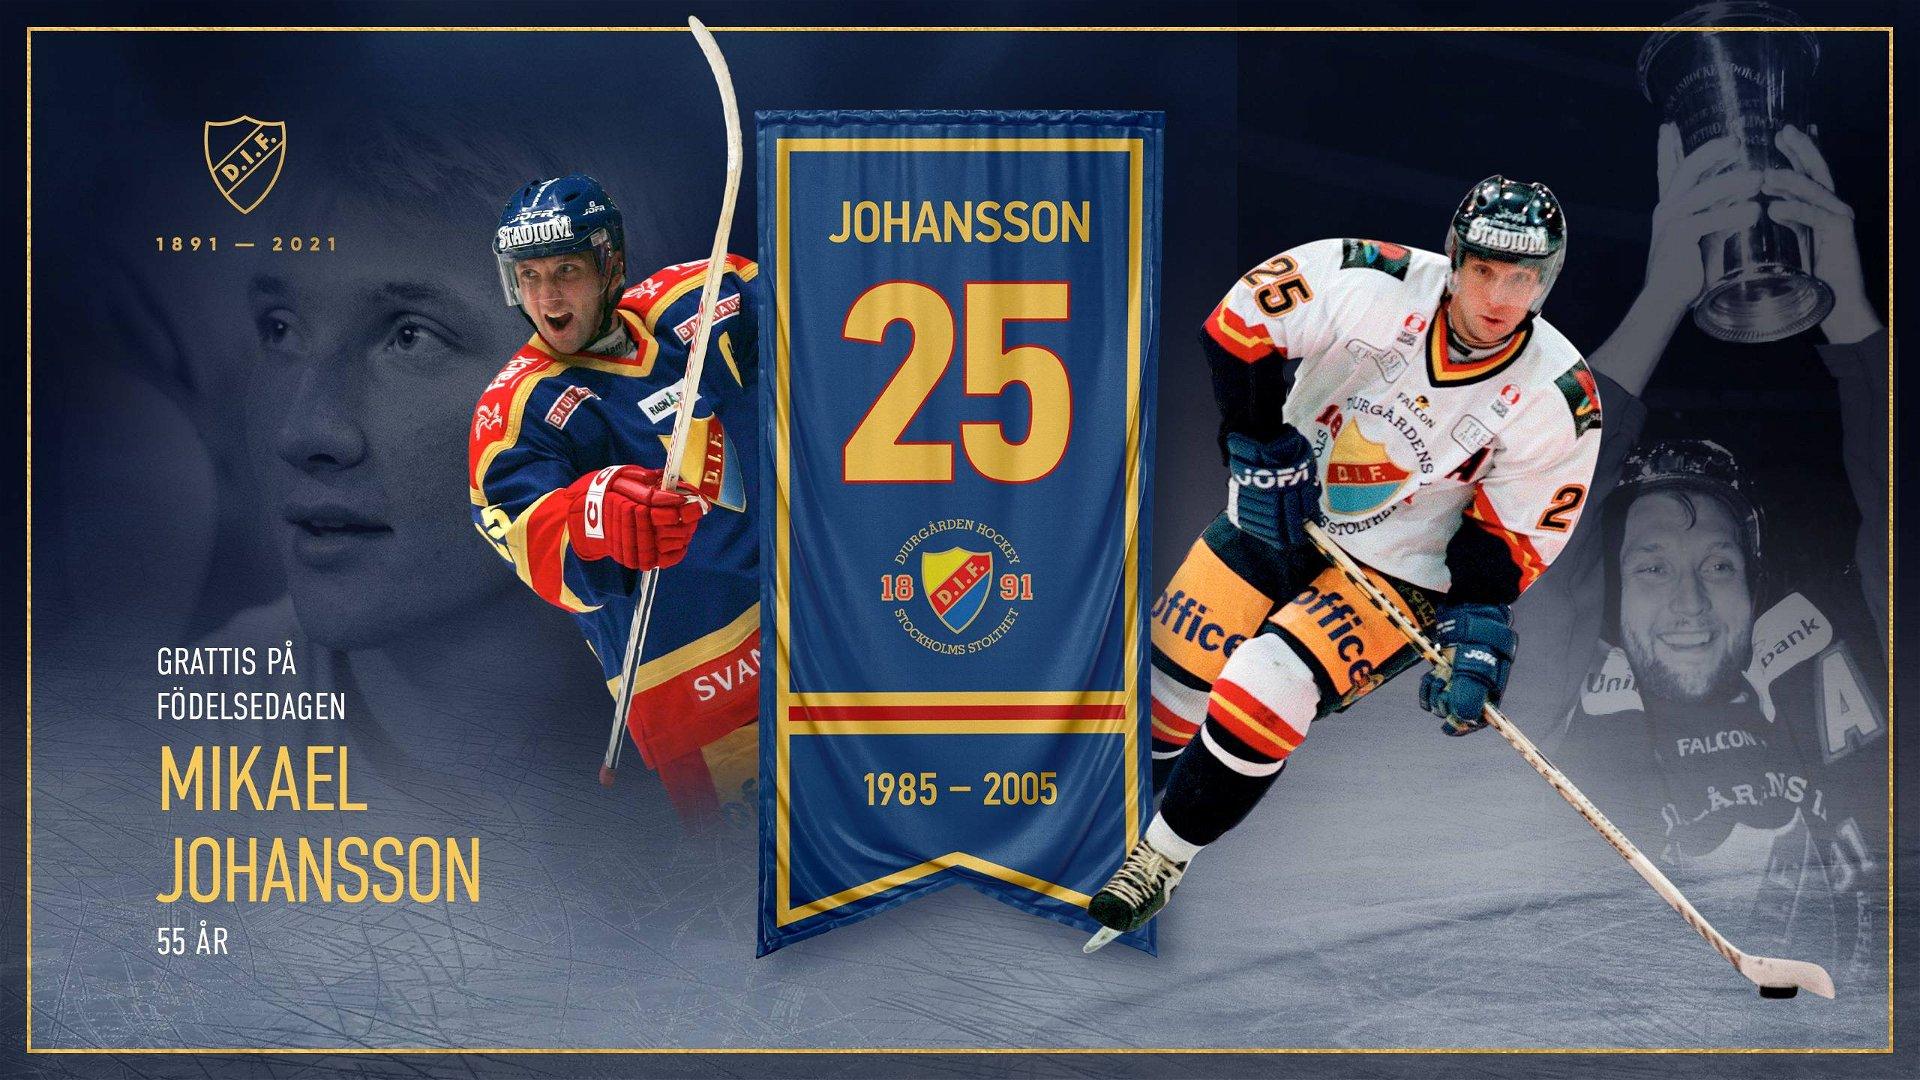 Grattis Mikael Johansson, 55 år